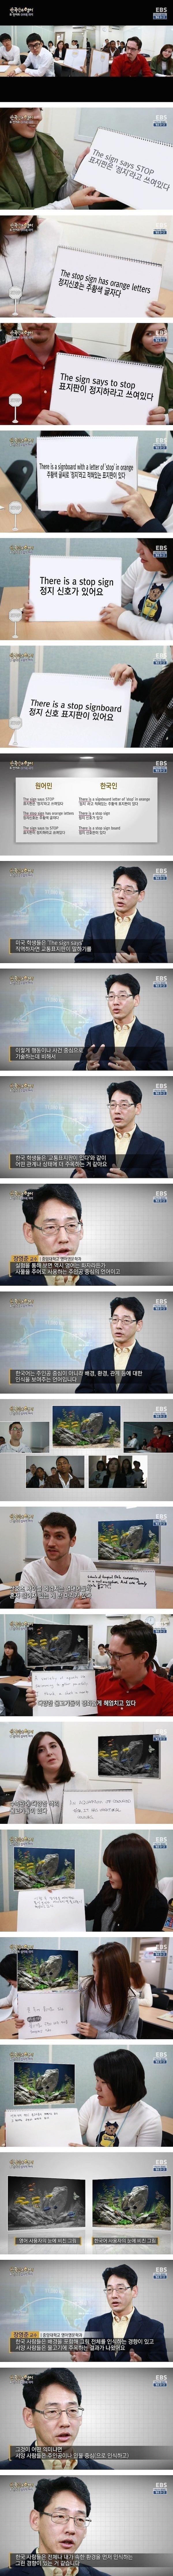 proxy.jpg 한국인에게 영어가 어려운 이유